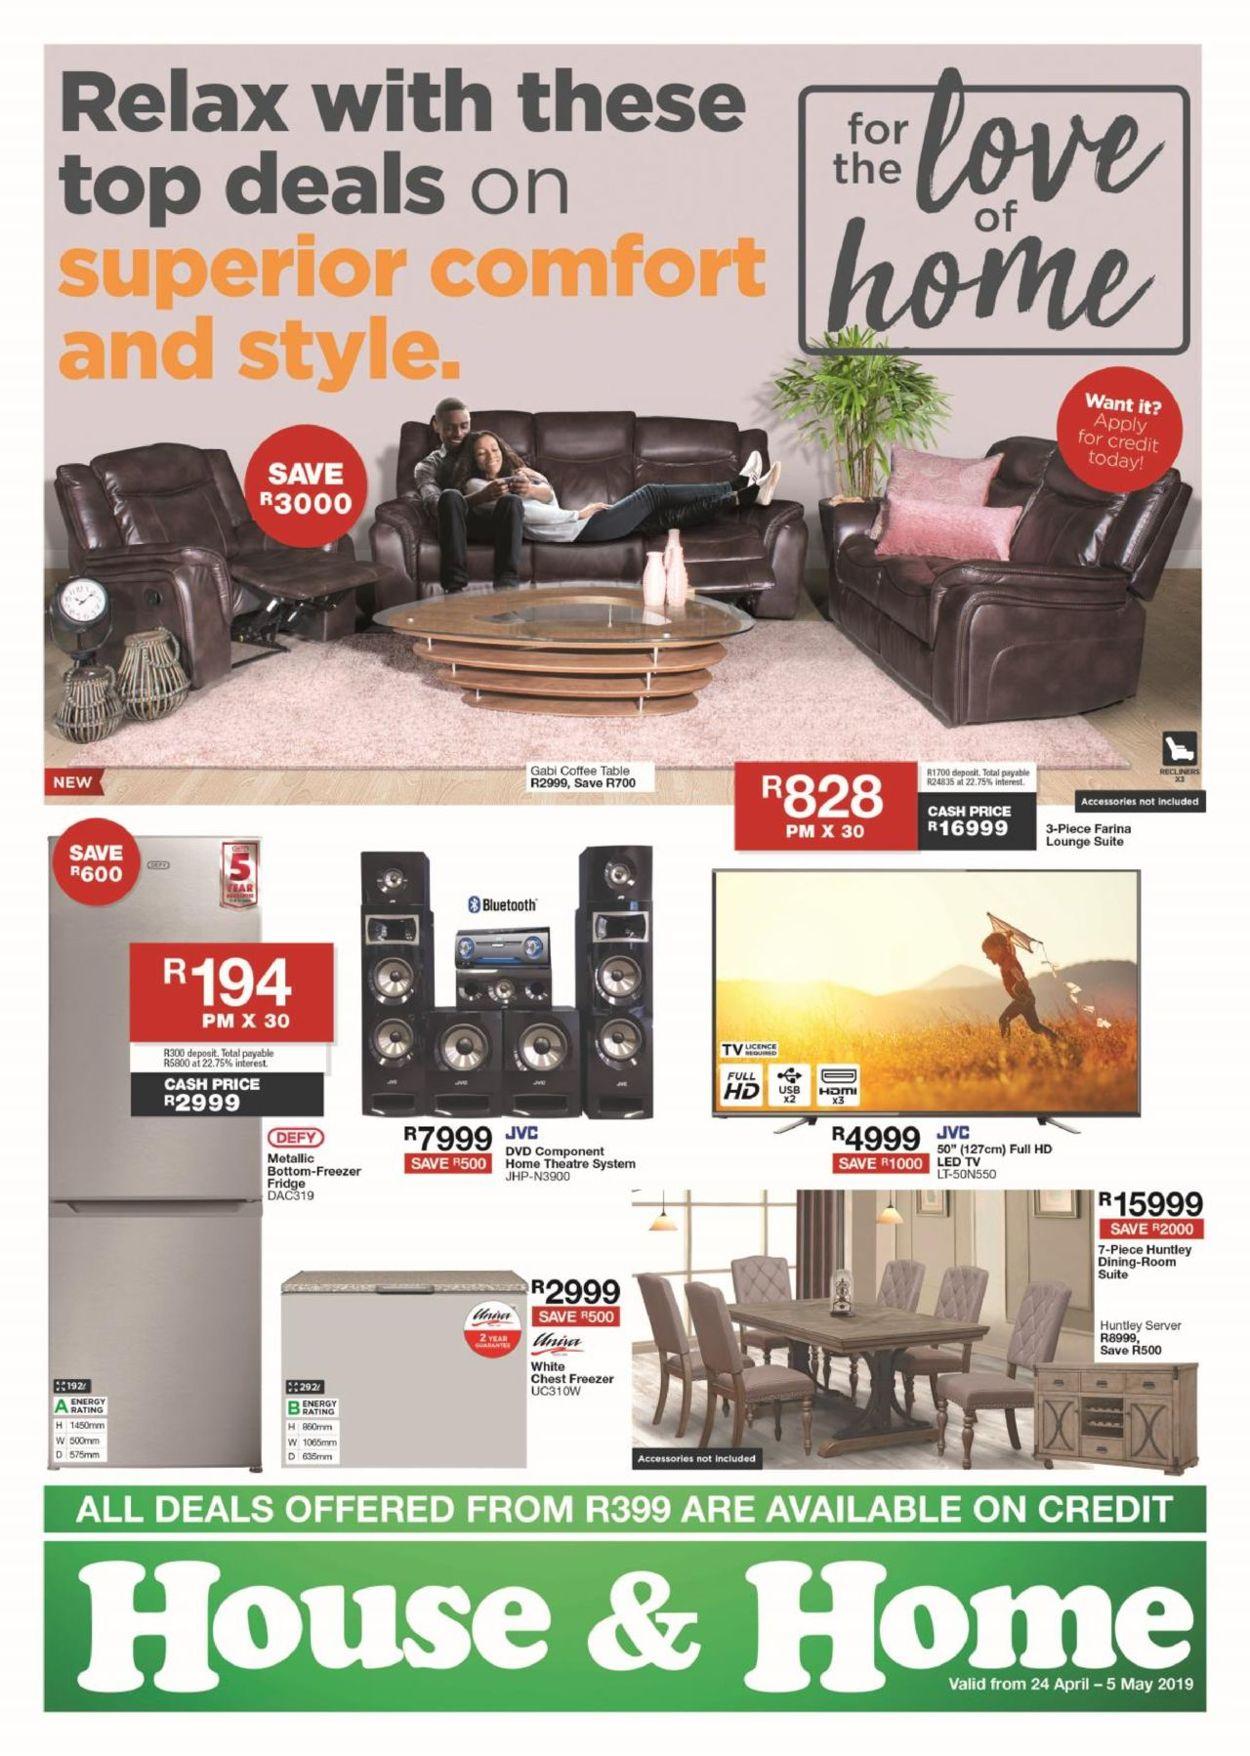 House & Home Catalogue - 2019/04/24-2019/05/05